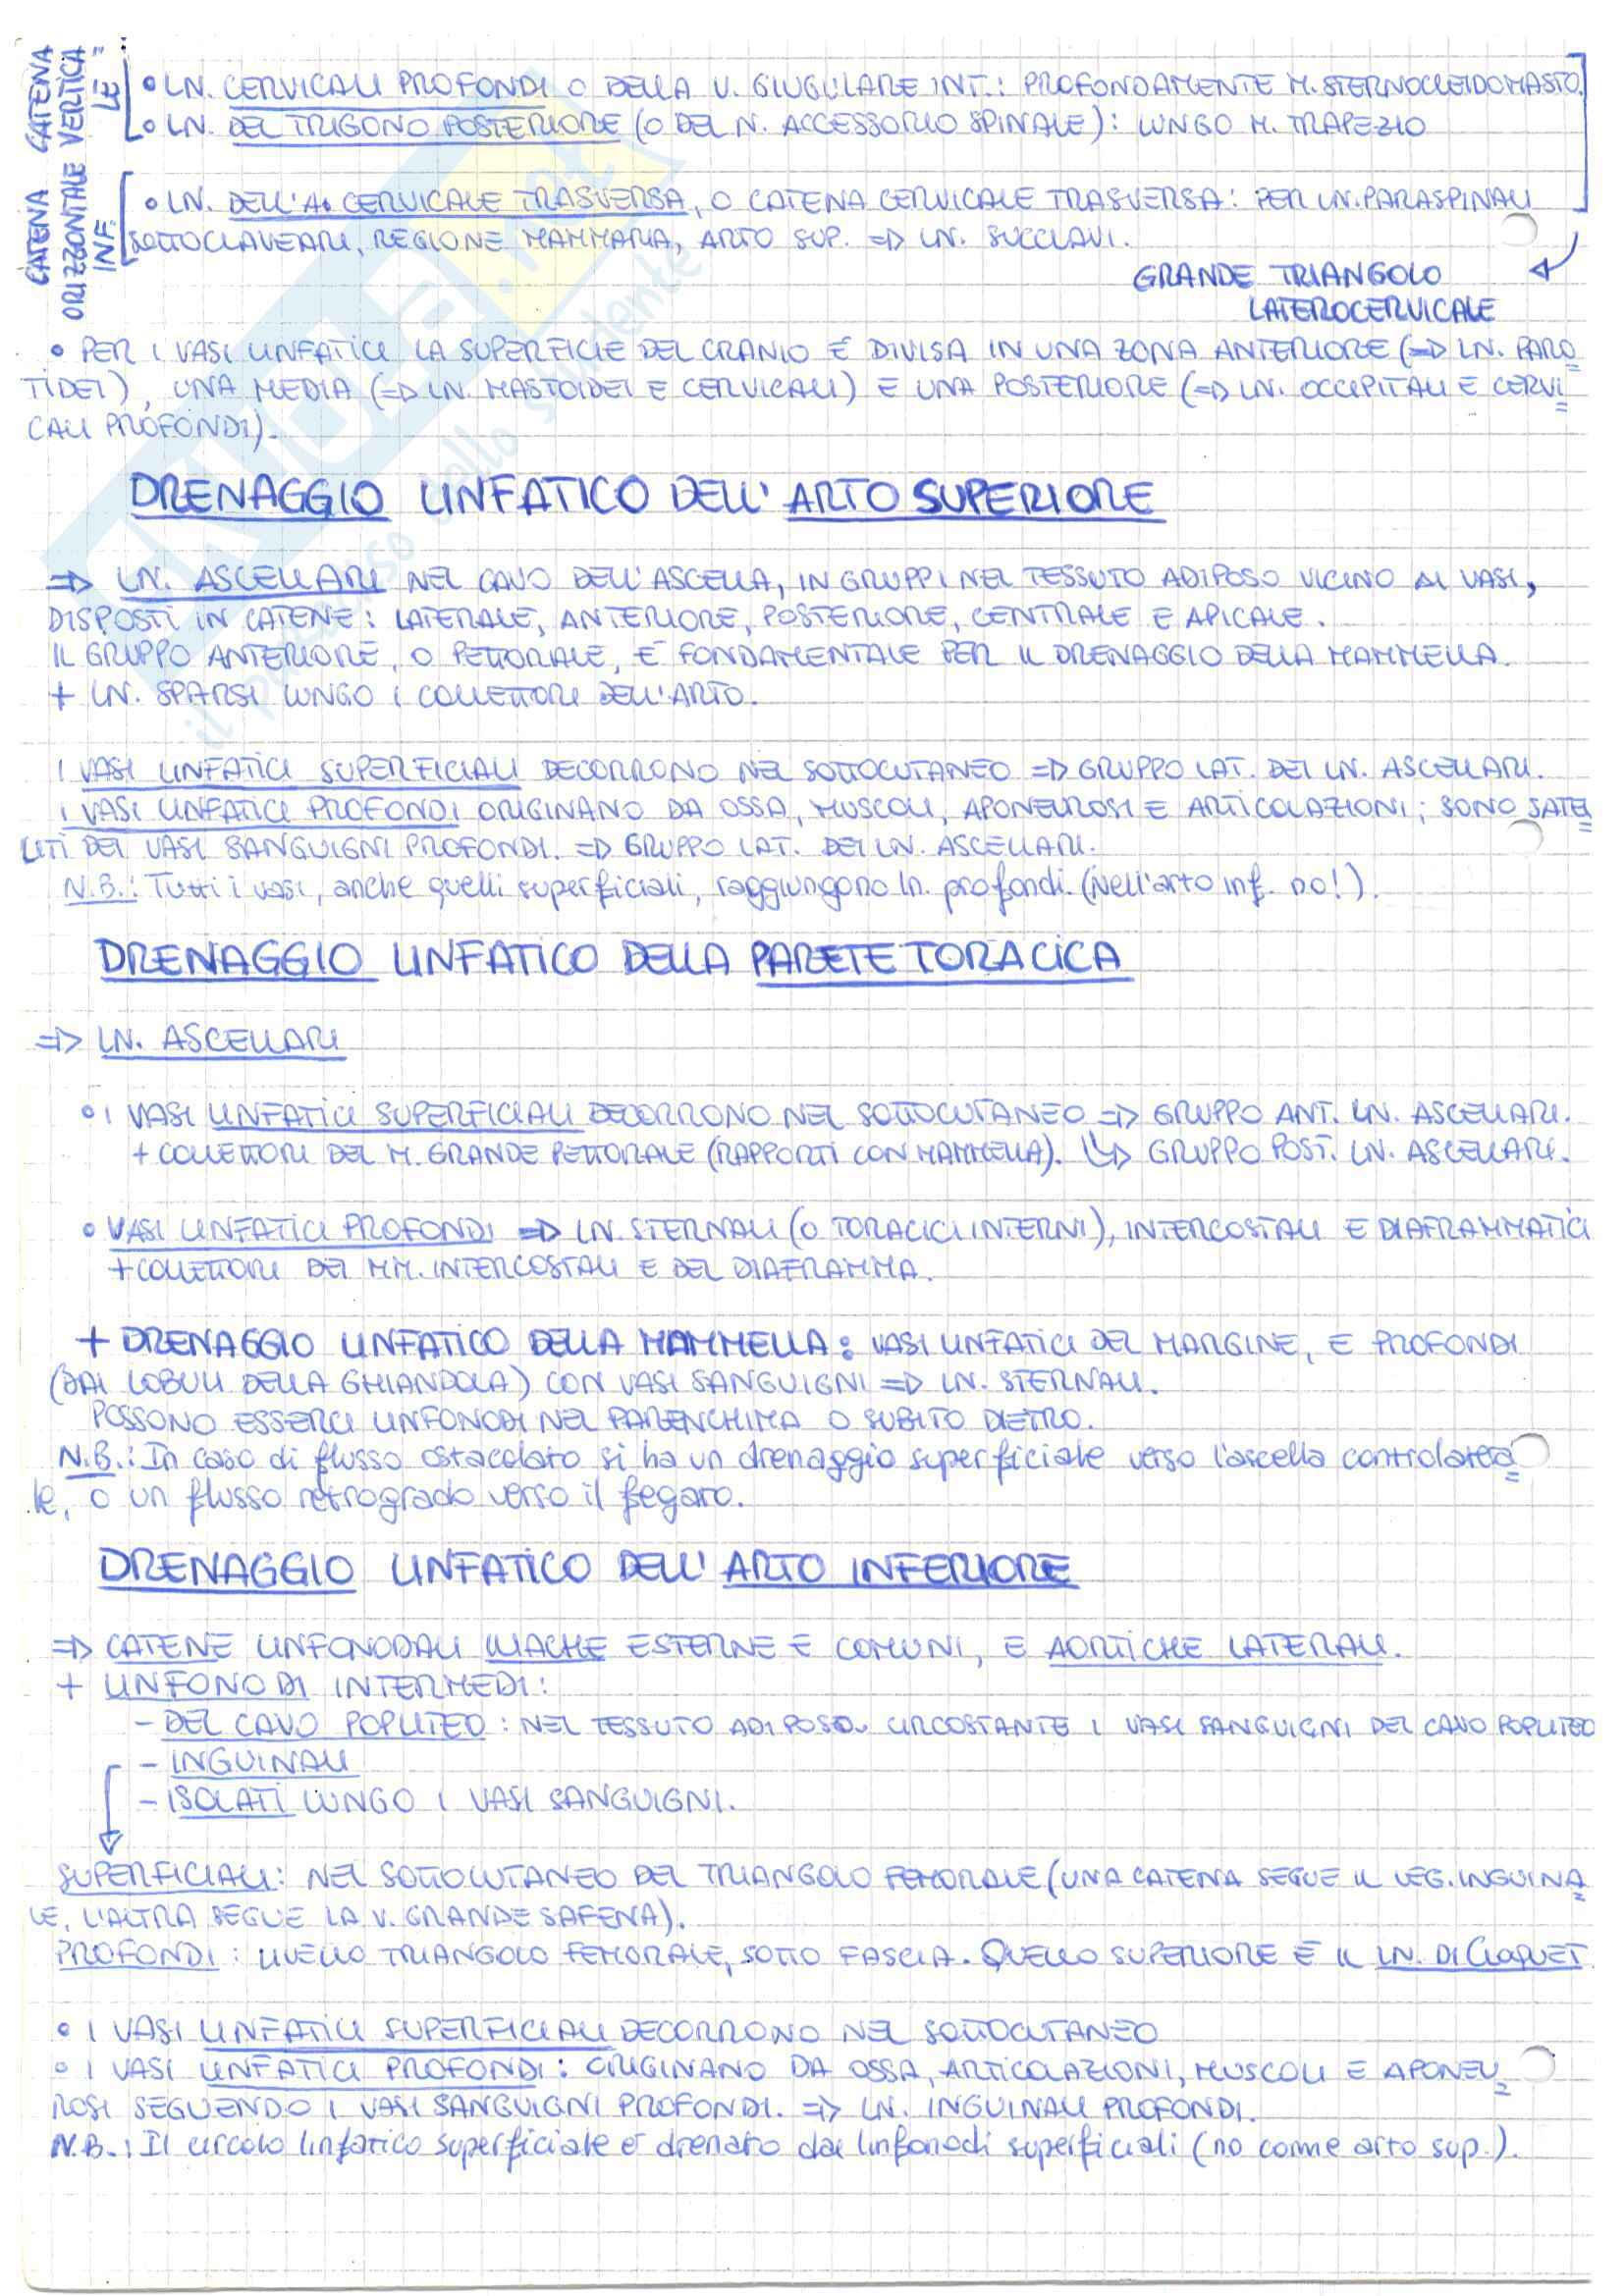 Riassunto esame Anatomia Umana, prof. Onori, libro consigliato Anastasi Pag. 26